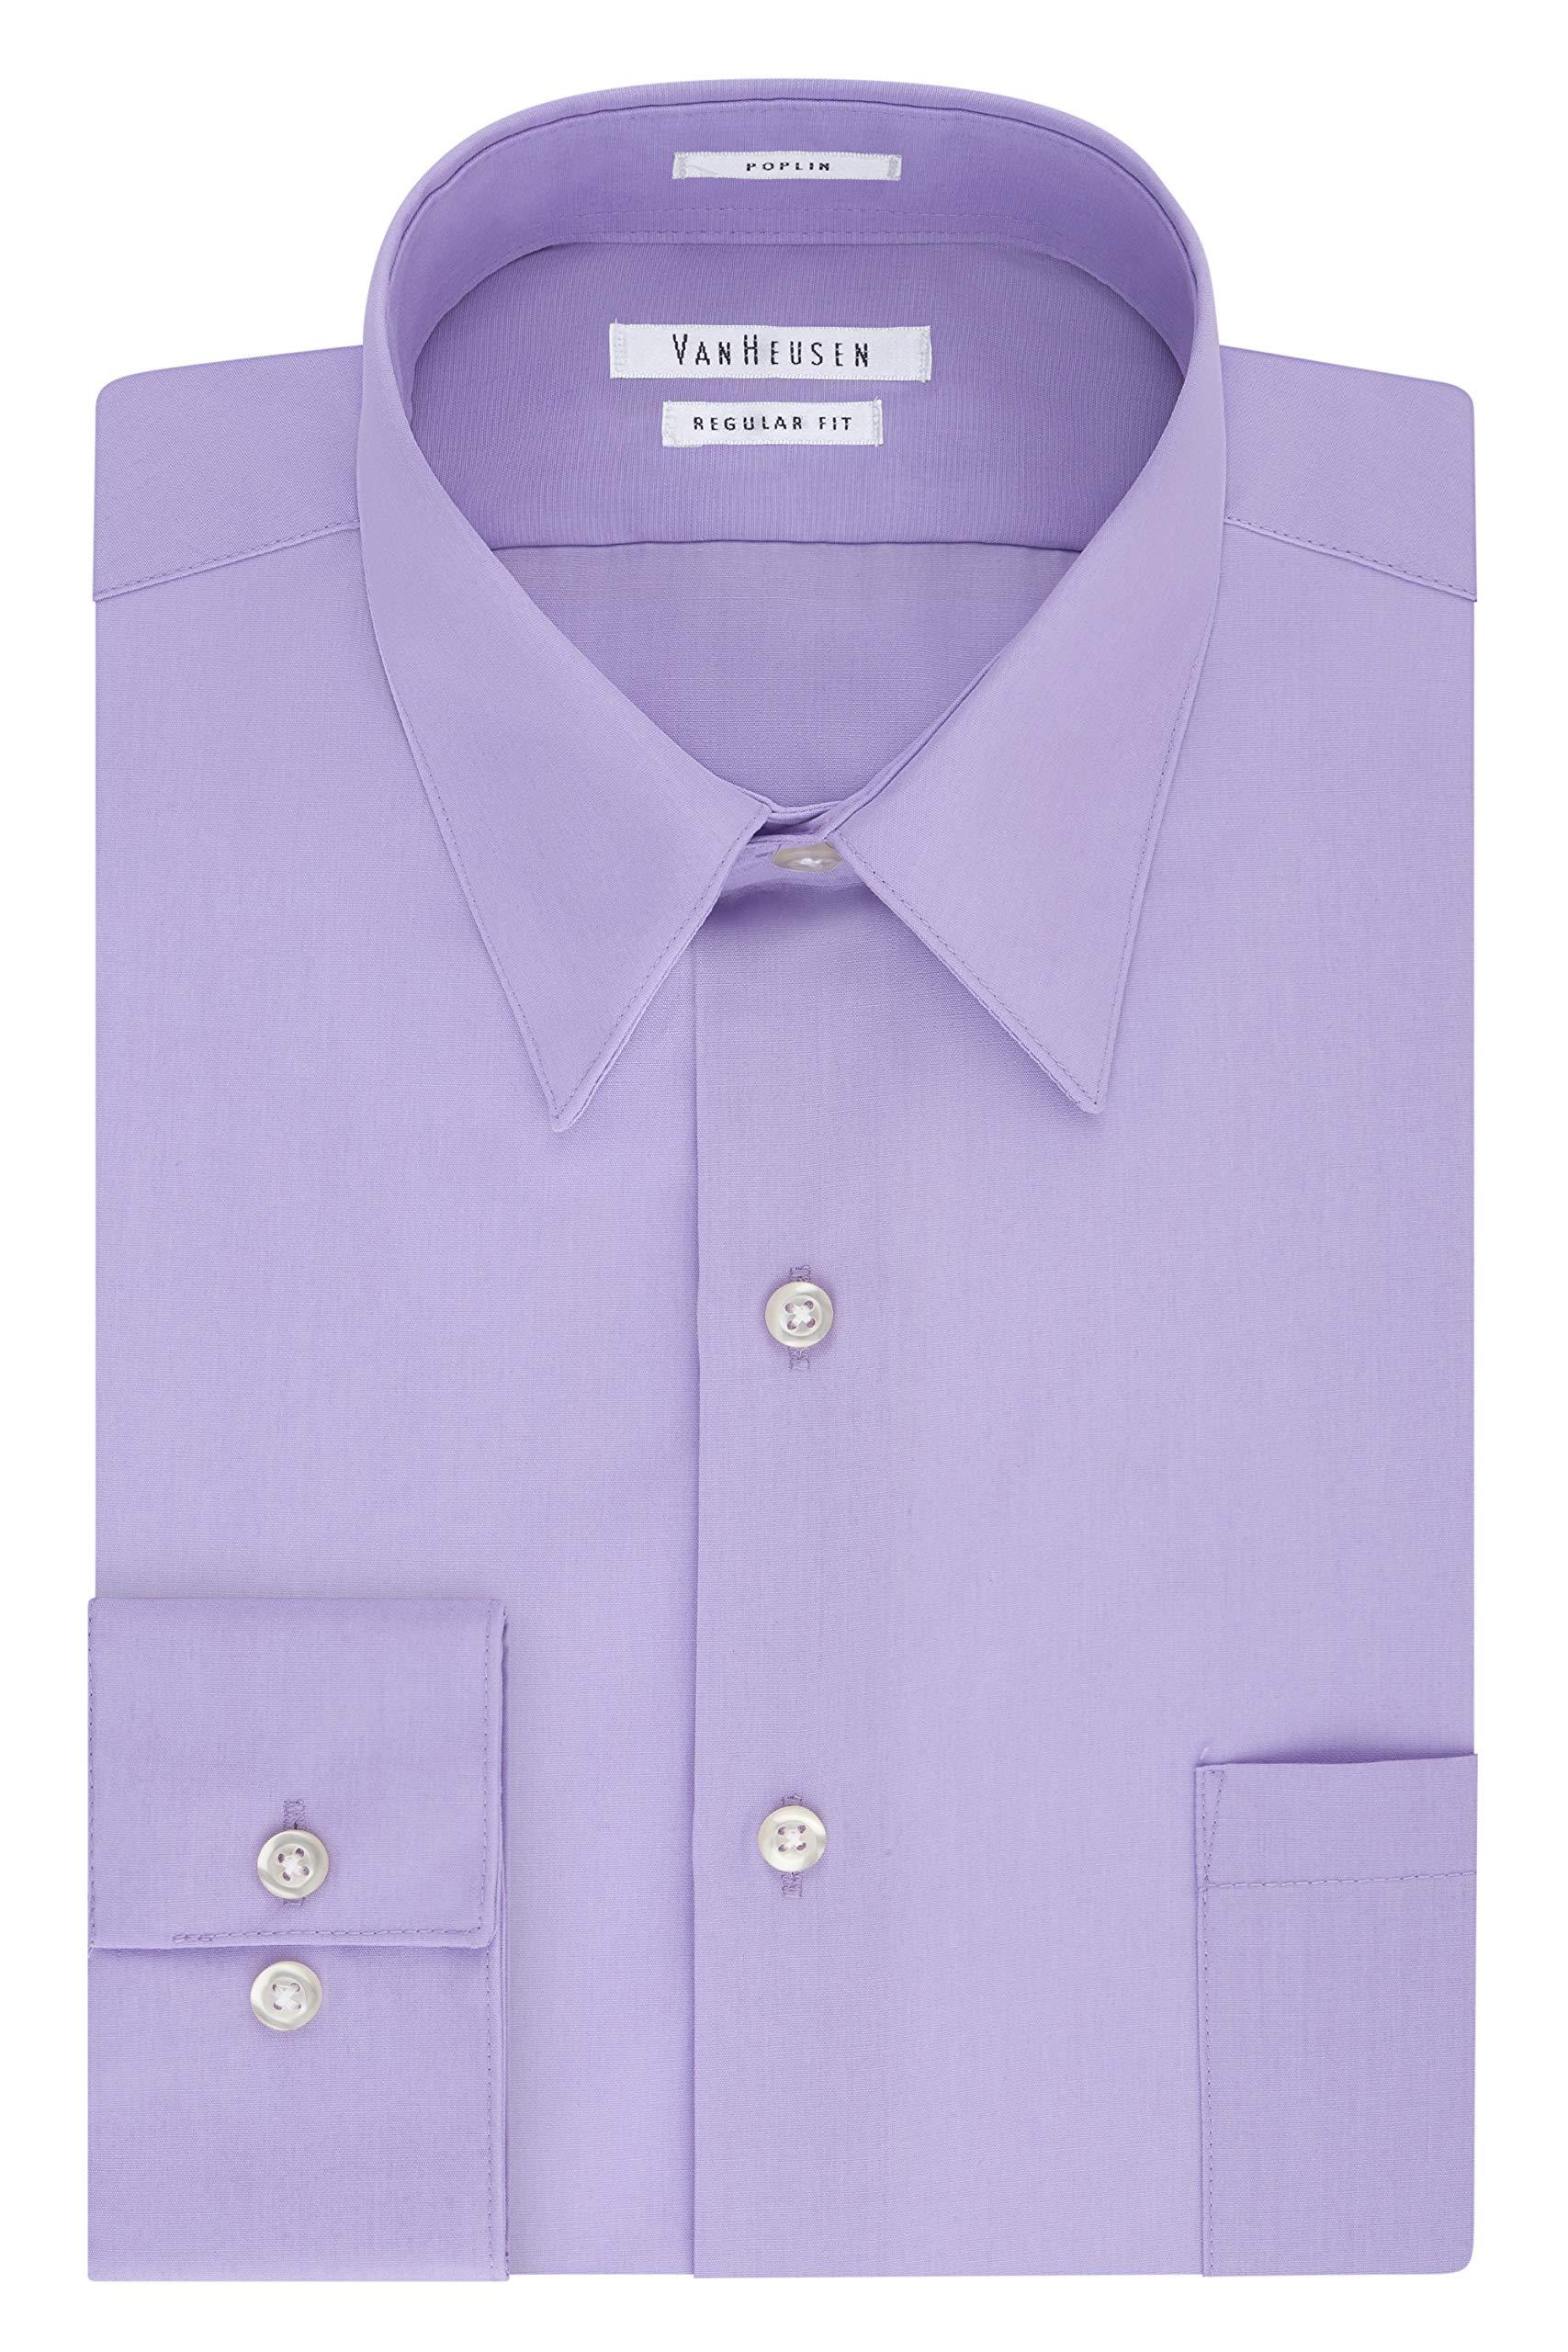 Van Heusen Men's Big and Tall Dress Shirt Regular Fit Poplin Solid, Lavender, 18'' Neck 34''-35'' Sleeve